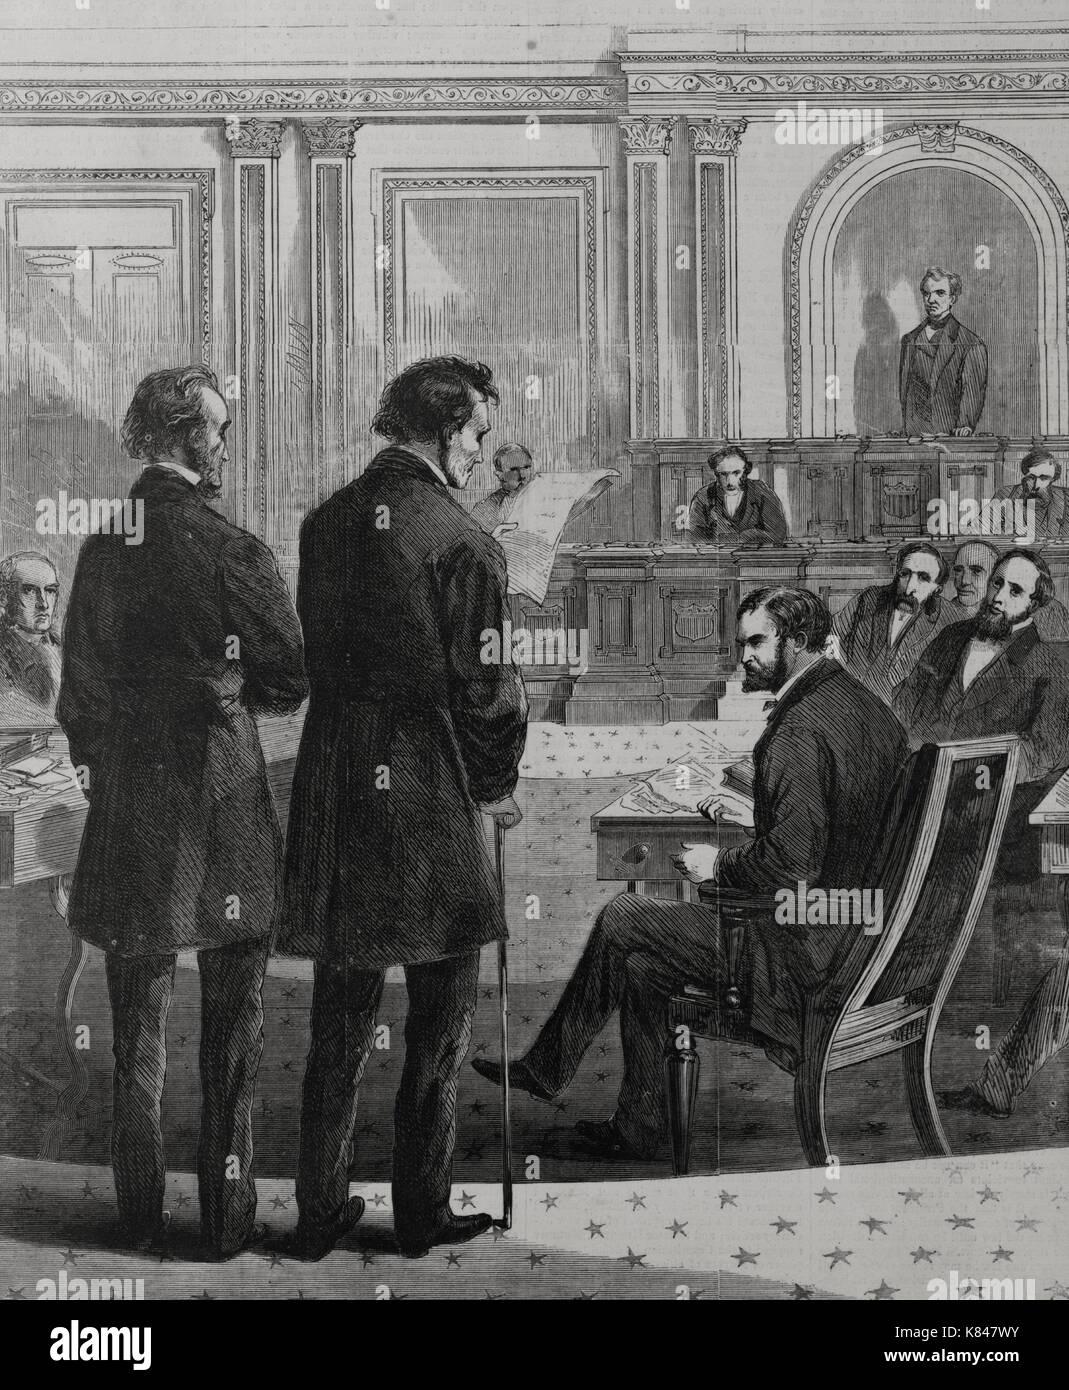 Impeachment - Thaddeus Stevens and John A. Bingham before the Senate, 1868 - Stock Image